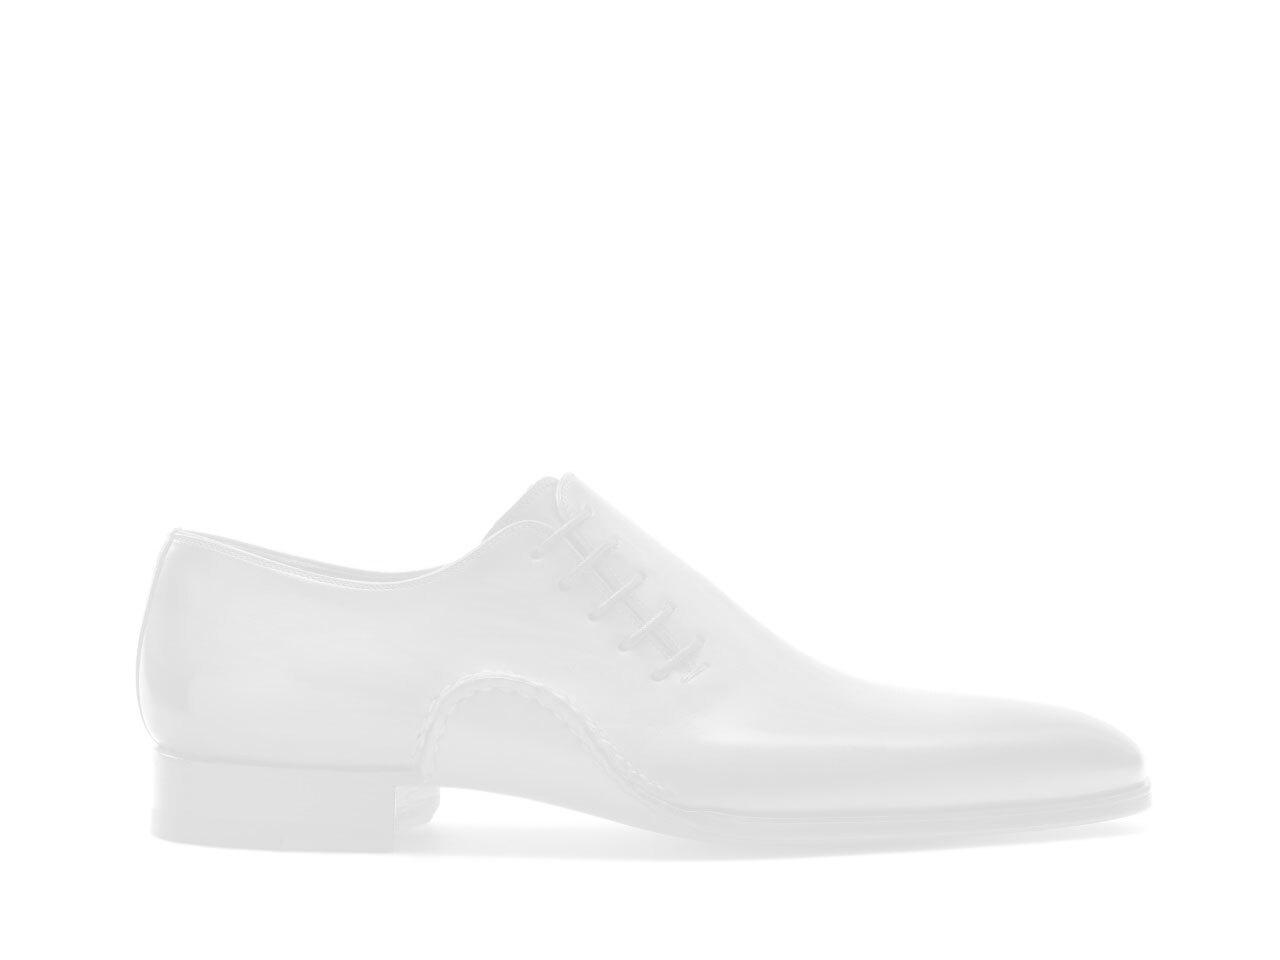 Side Profile of Leiva Cognac Shoes